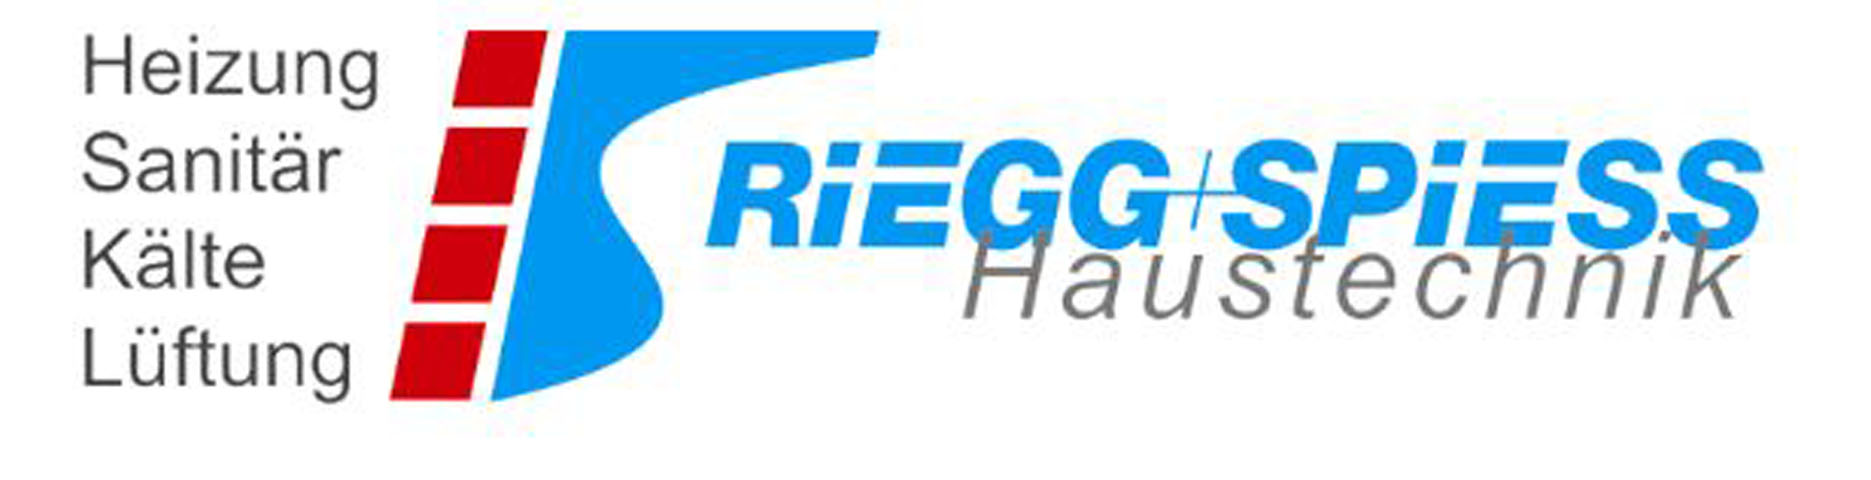 Riegg + Spiess Haustechnik GmbH & Co. KG